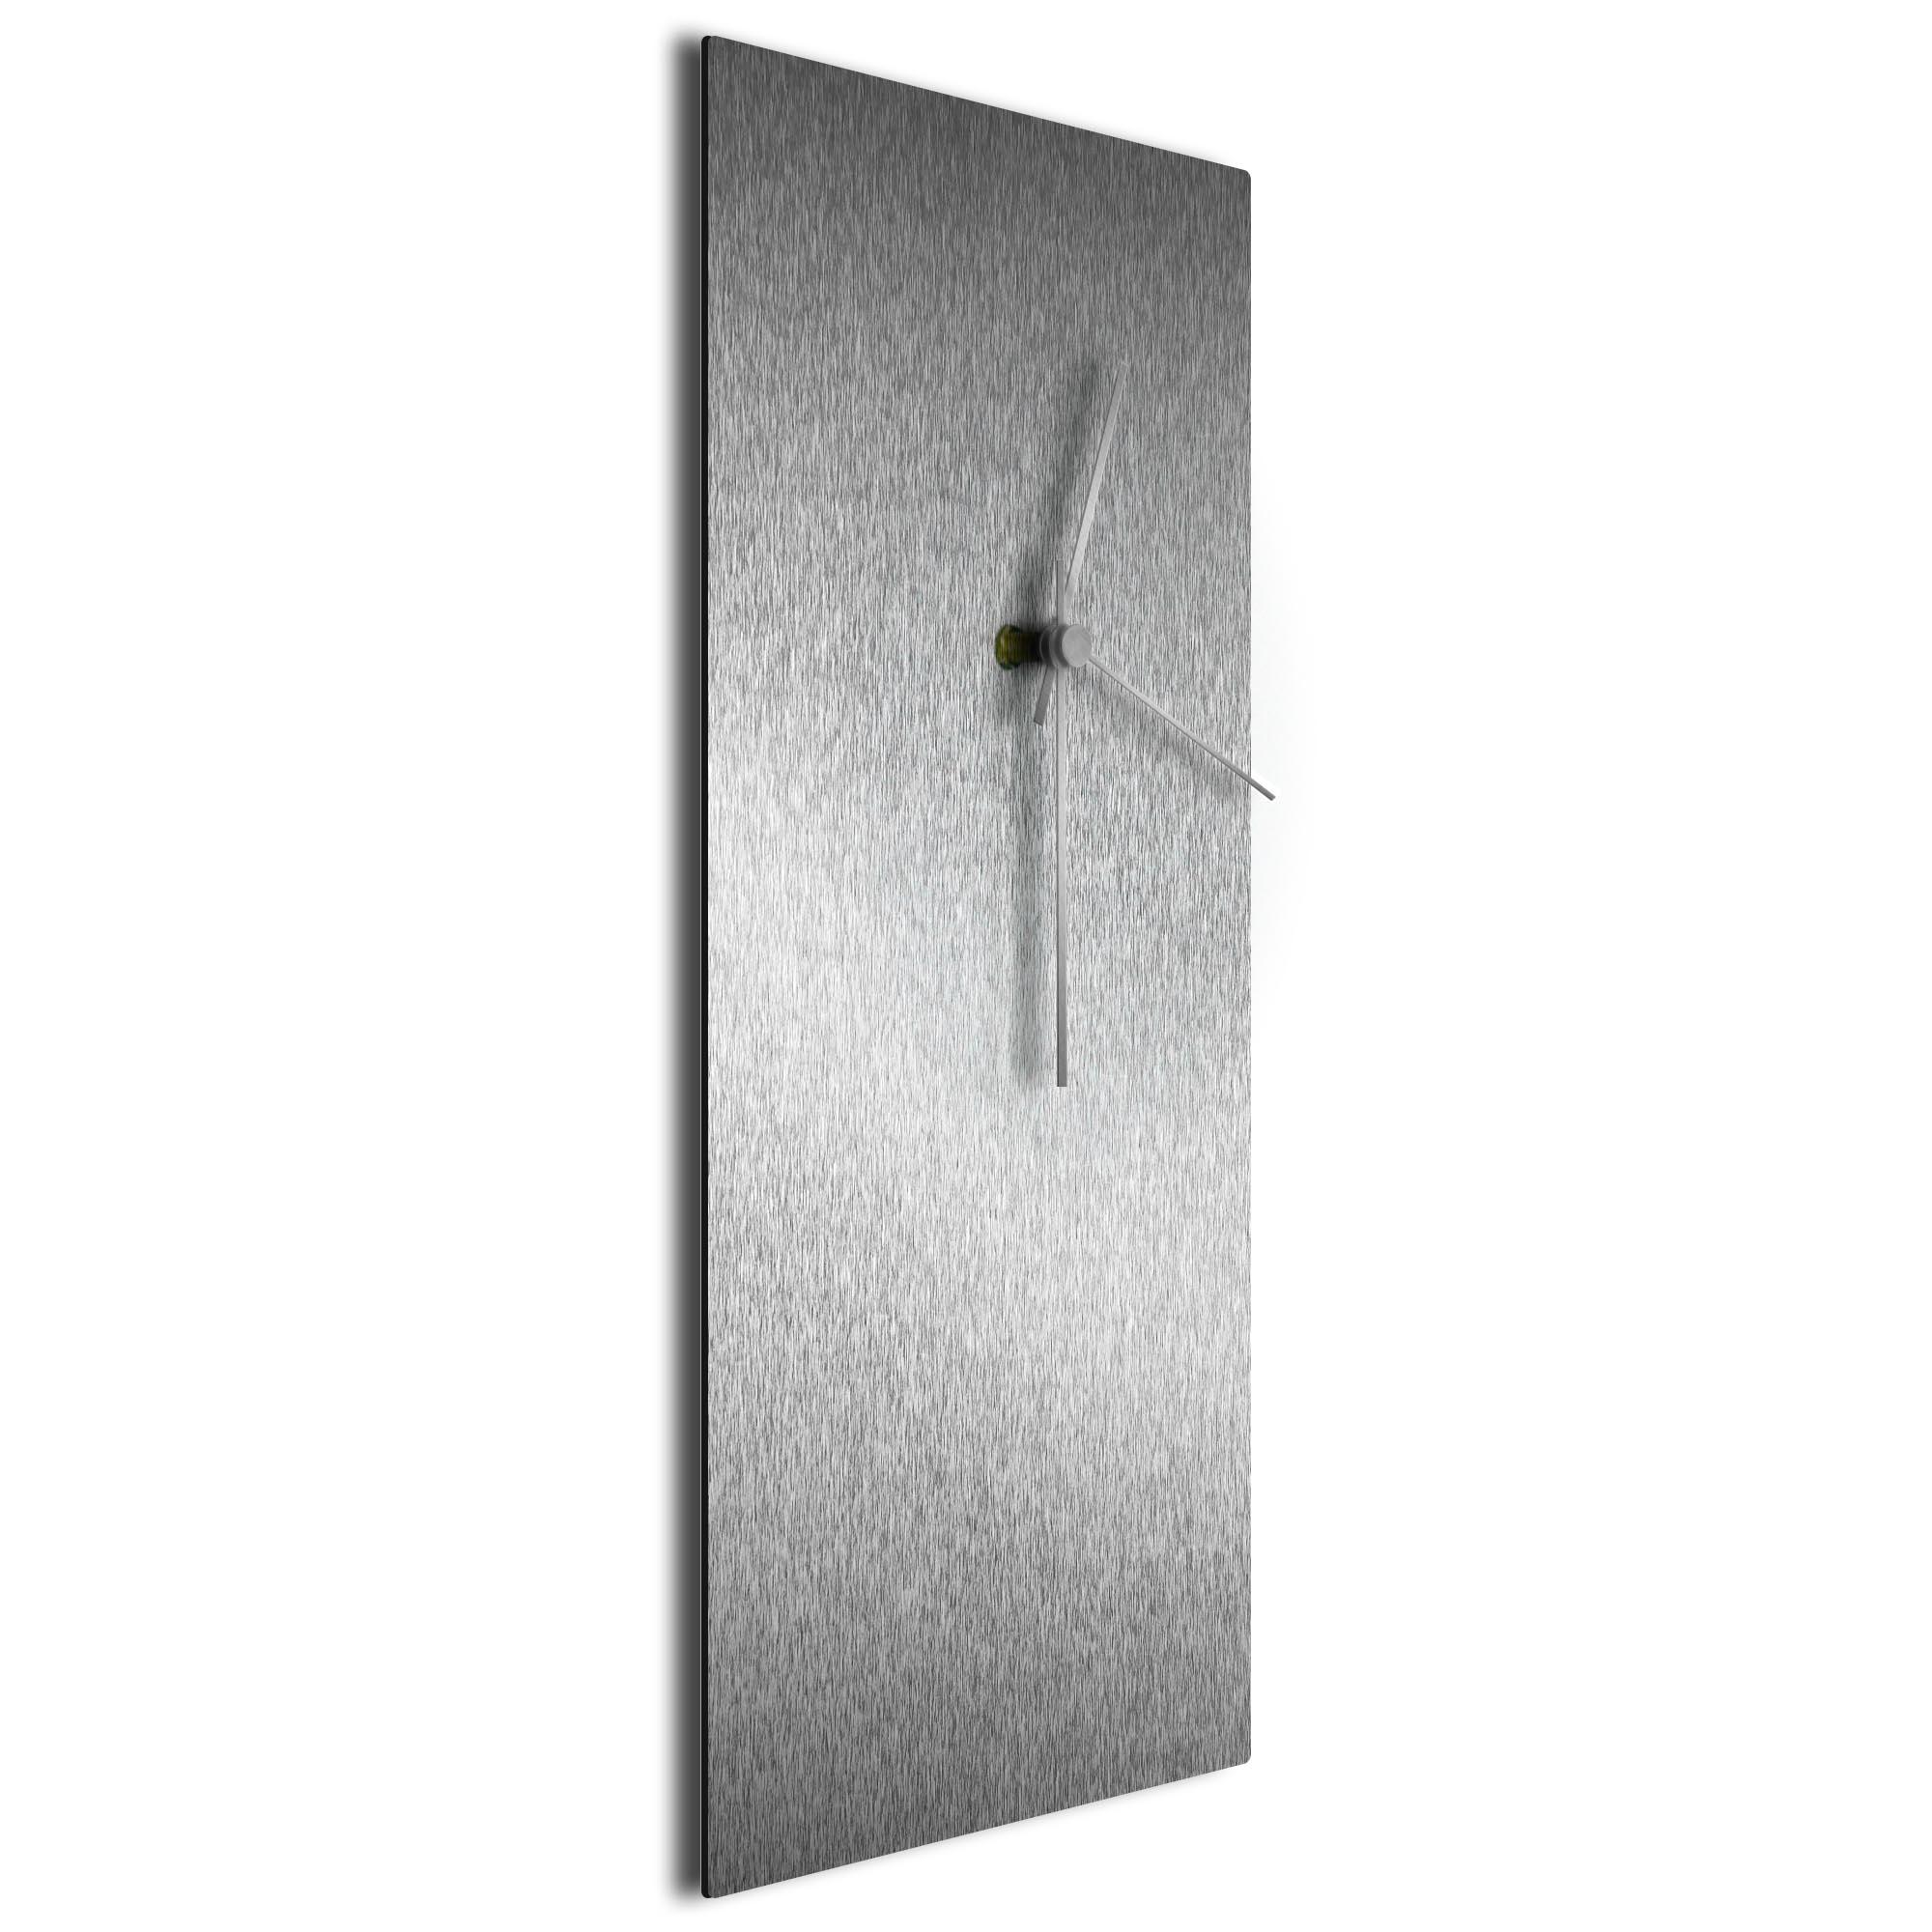 Silversmith Clock Silver - Image 2